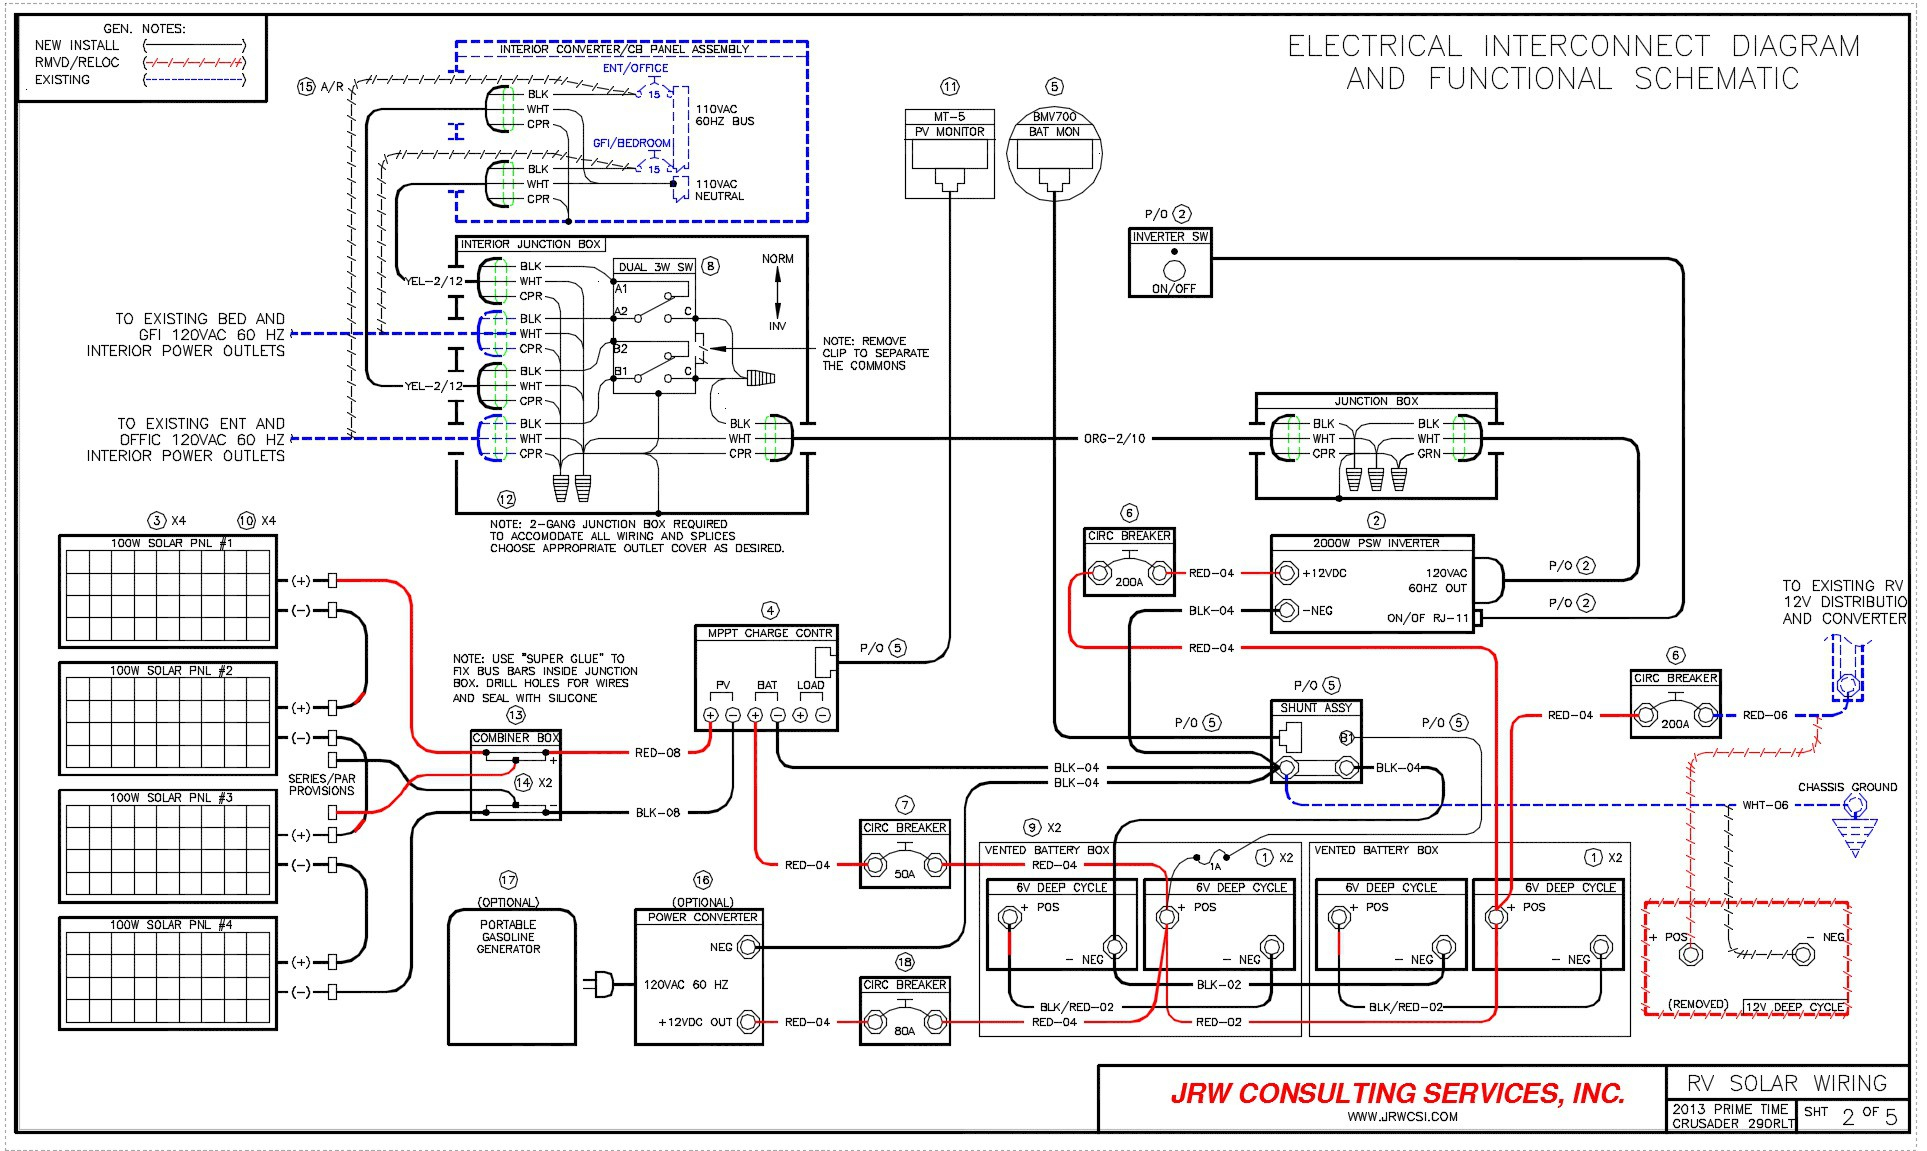 Travel Trailer Wiring Diagram In Camper 15 2 | Hastalavista - Camper Trailer Wiring Diagram